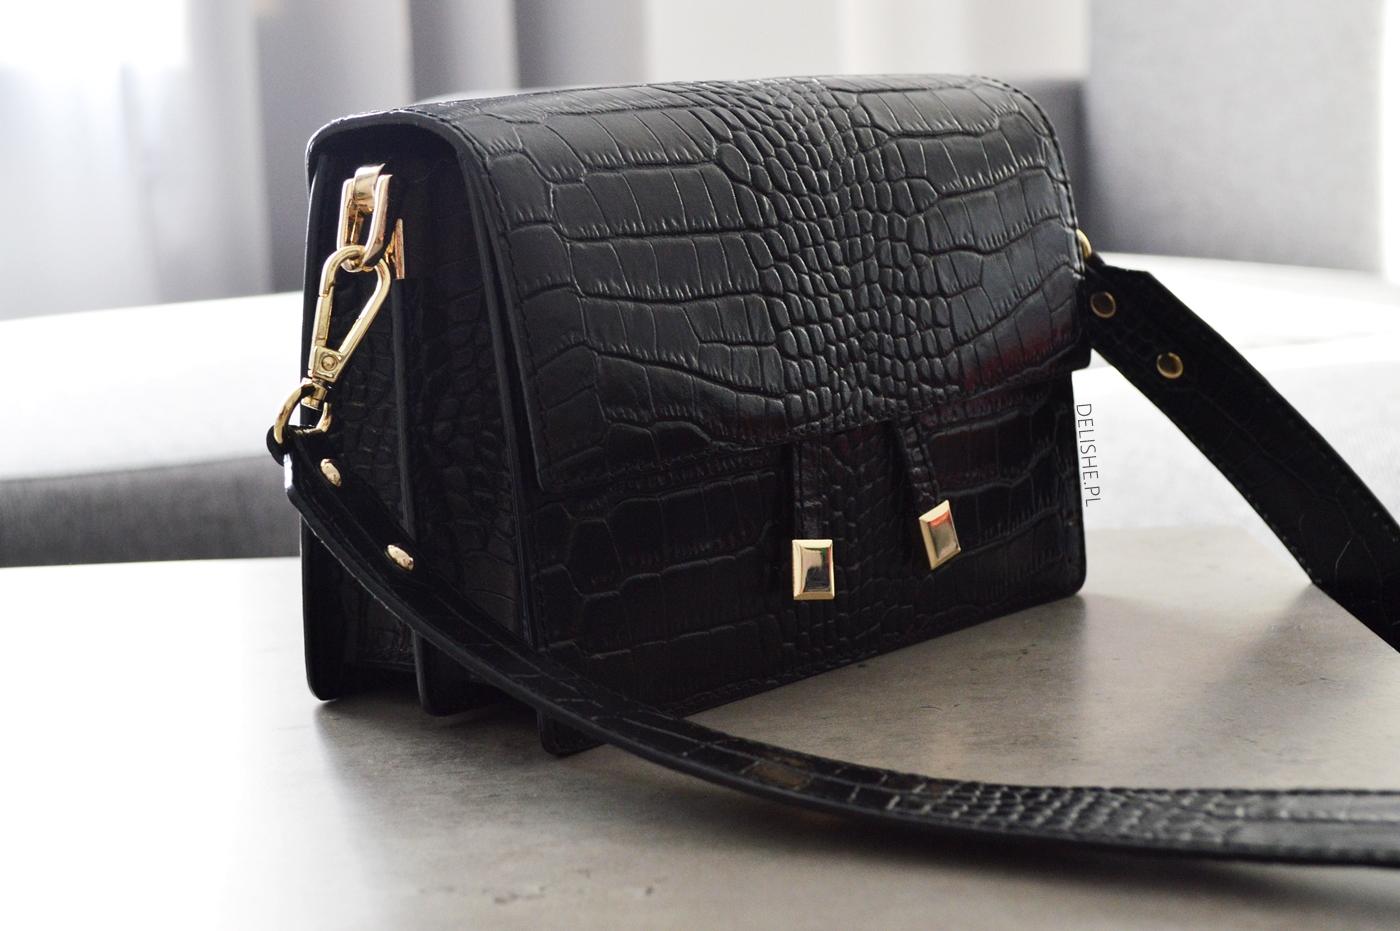 czarna skózana torebka korkodyl